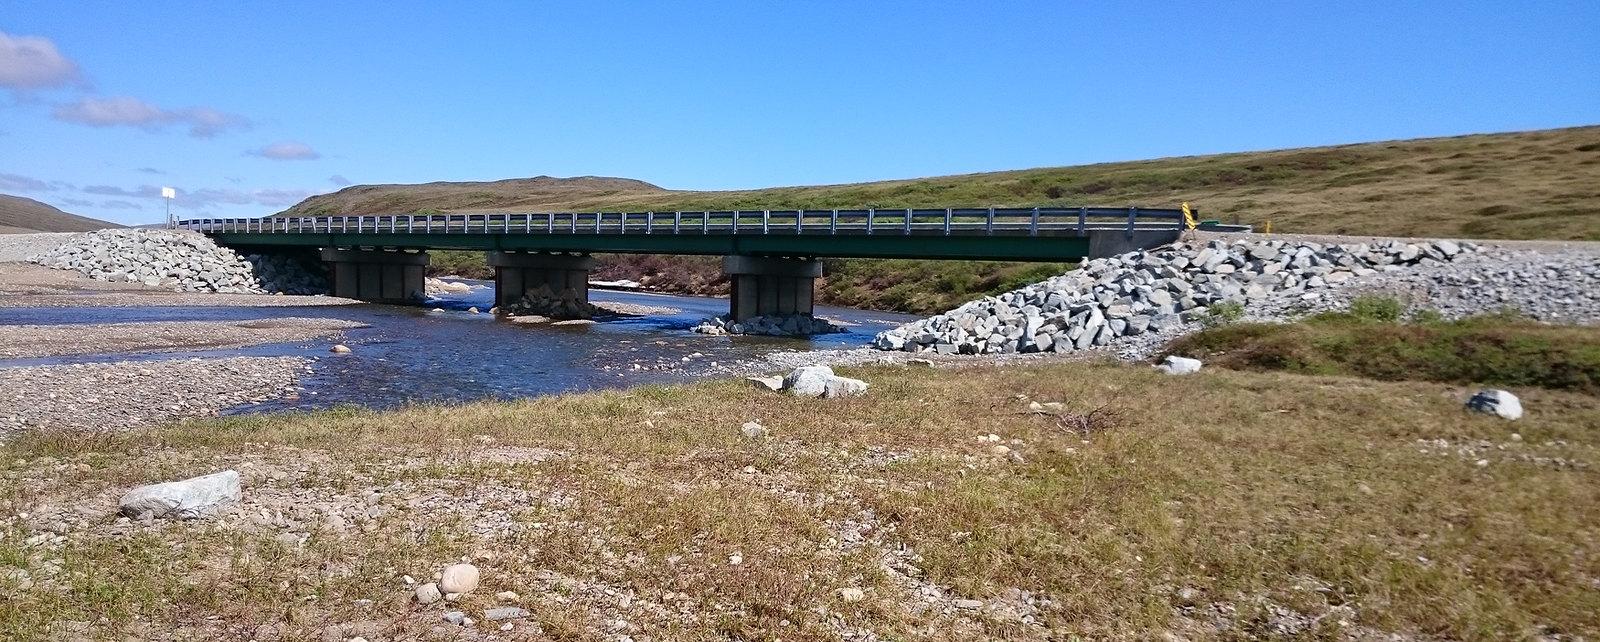 A nice bridge